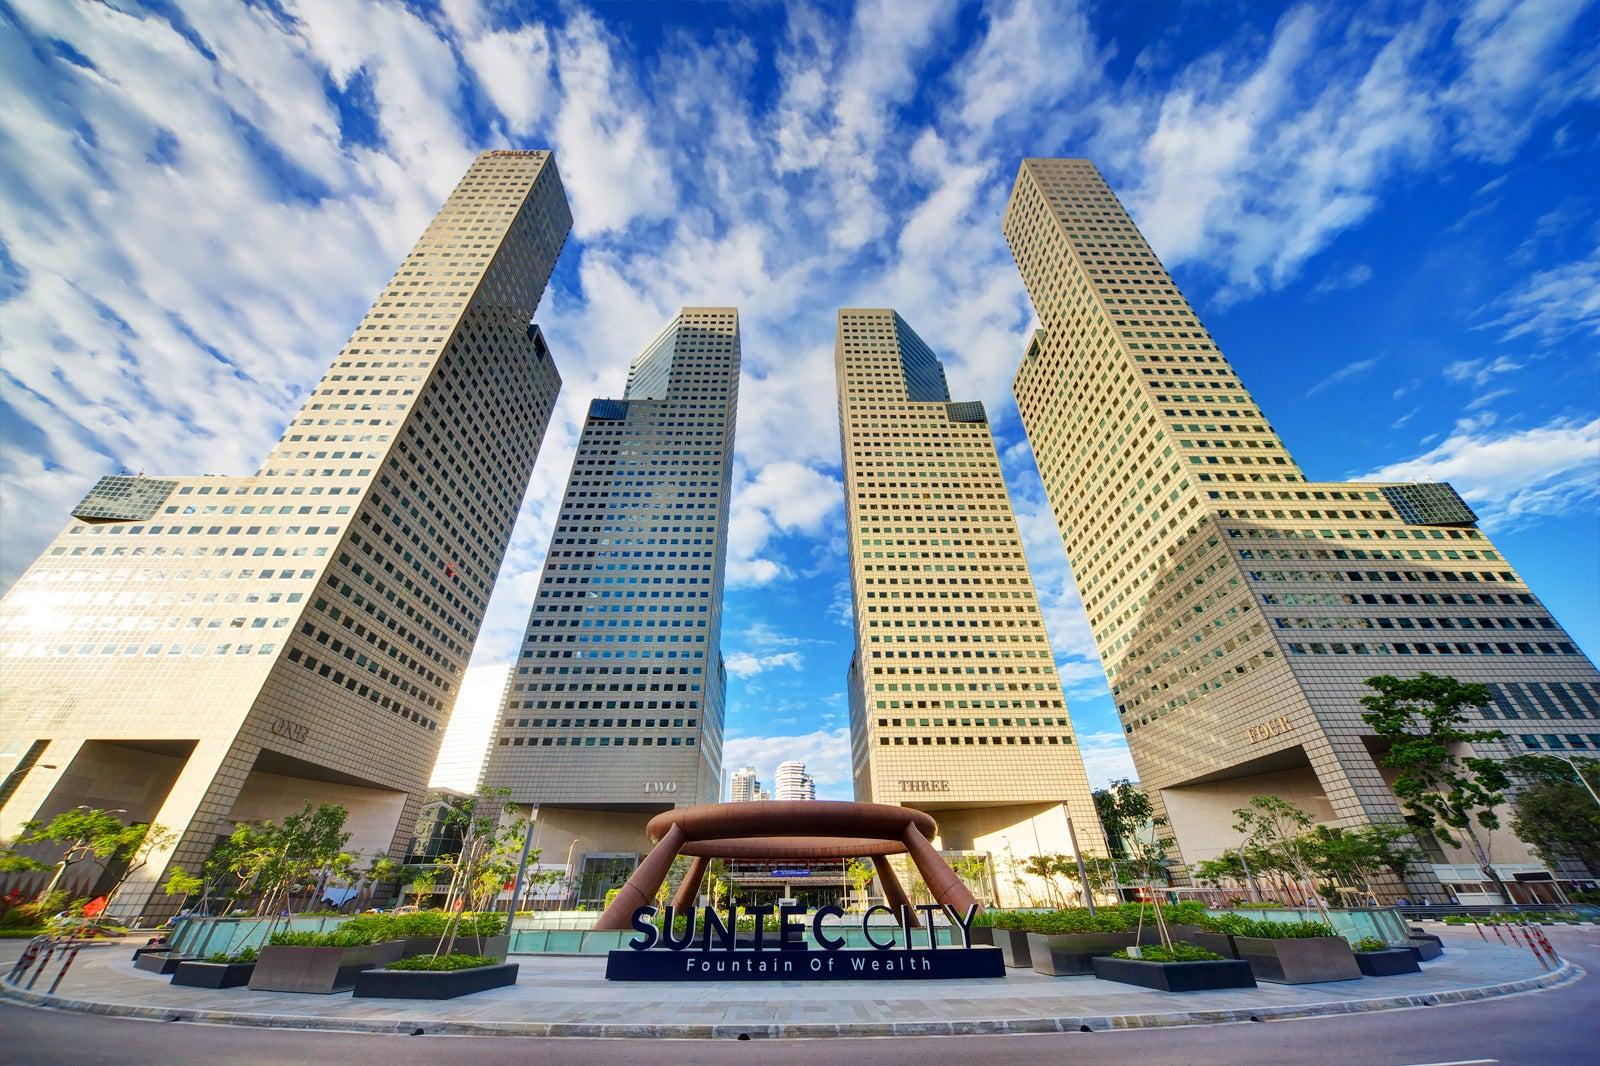 Suntec City - Singapore Shopping Complex